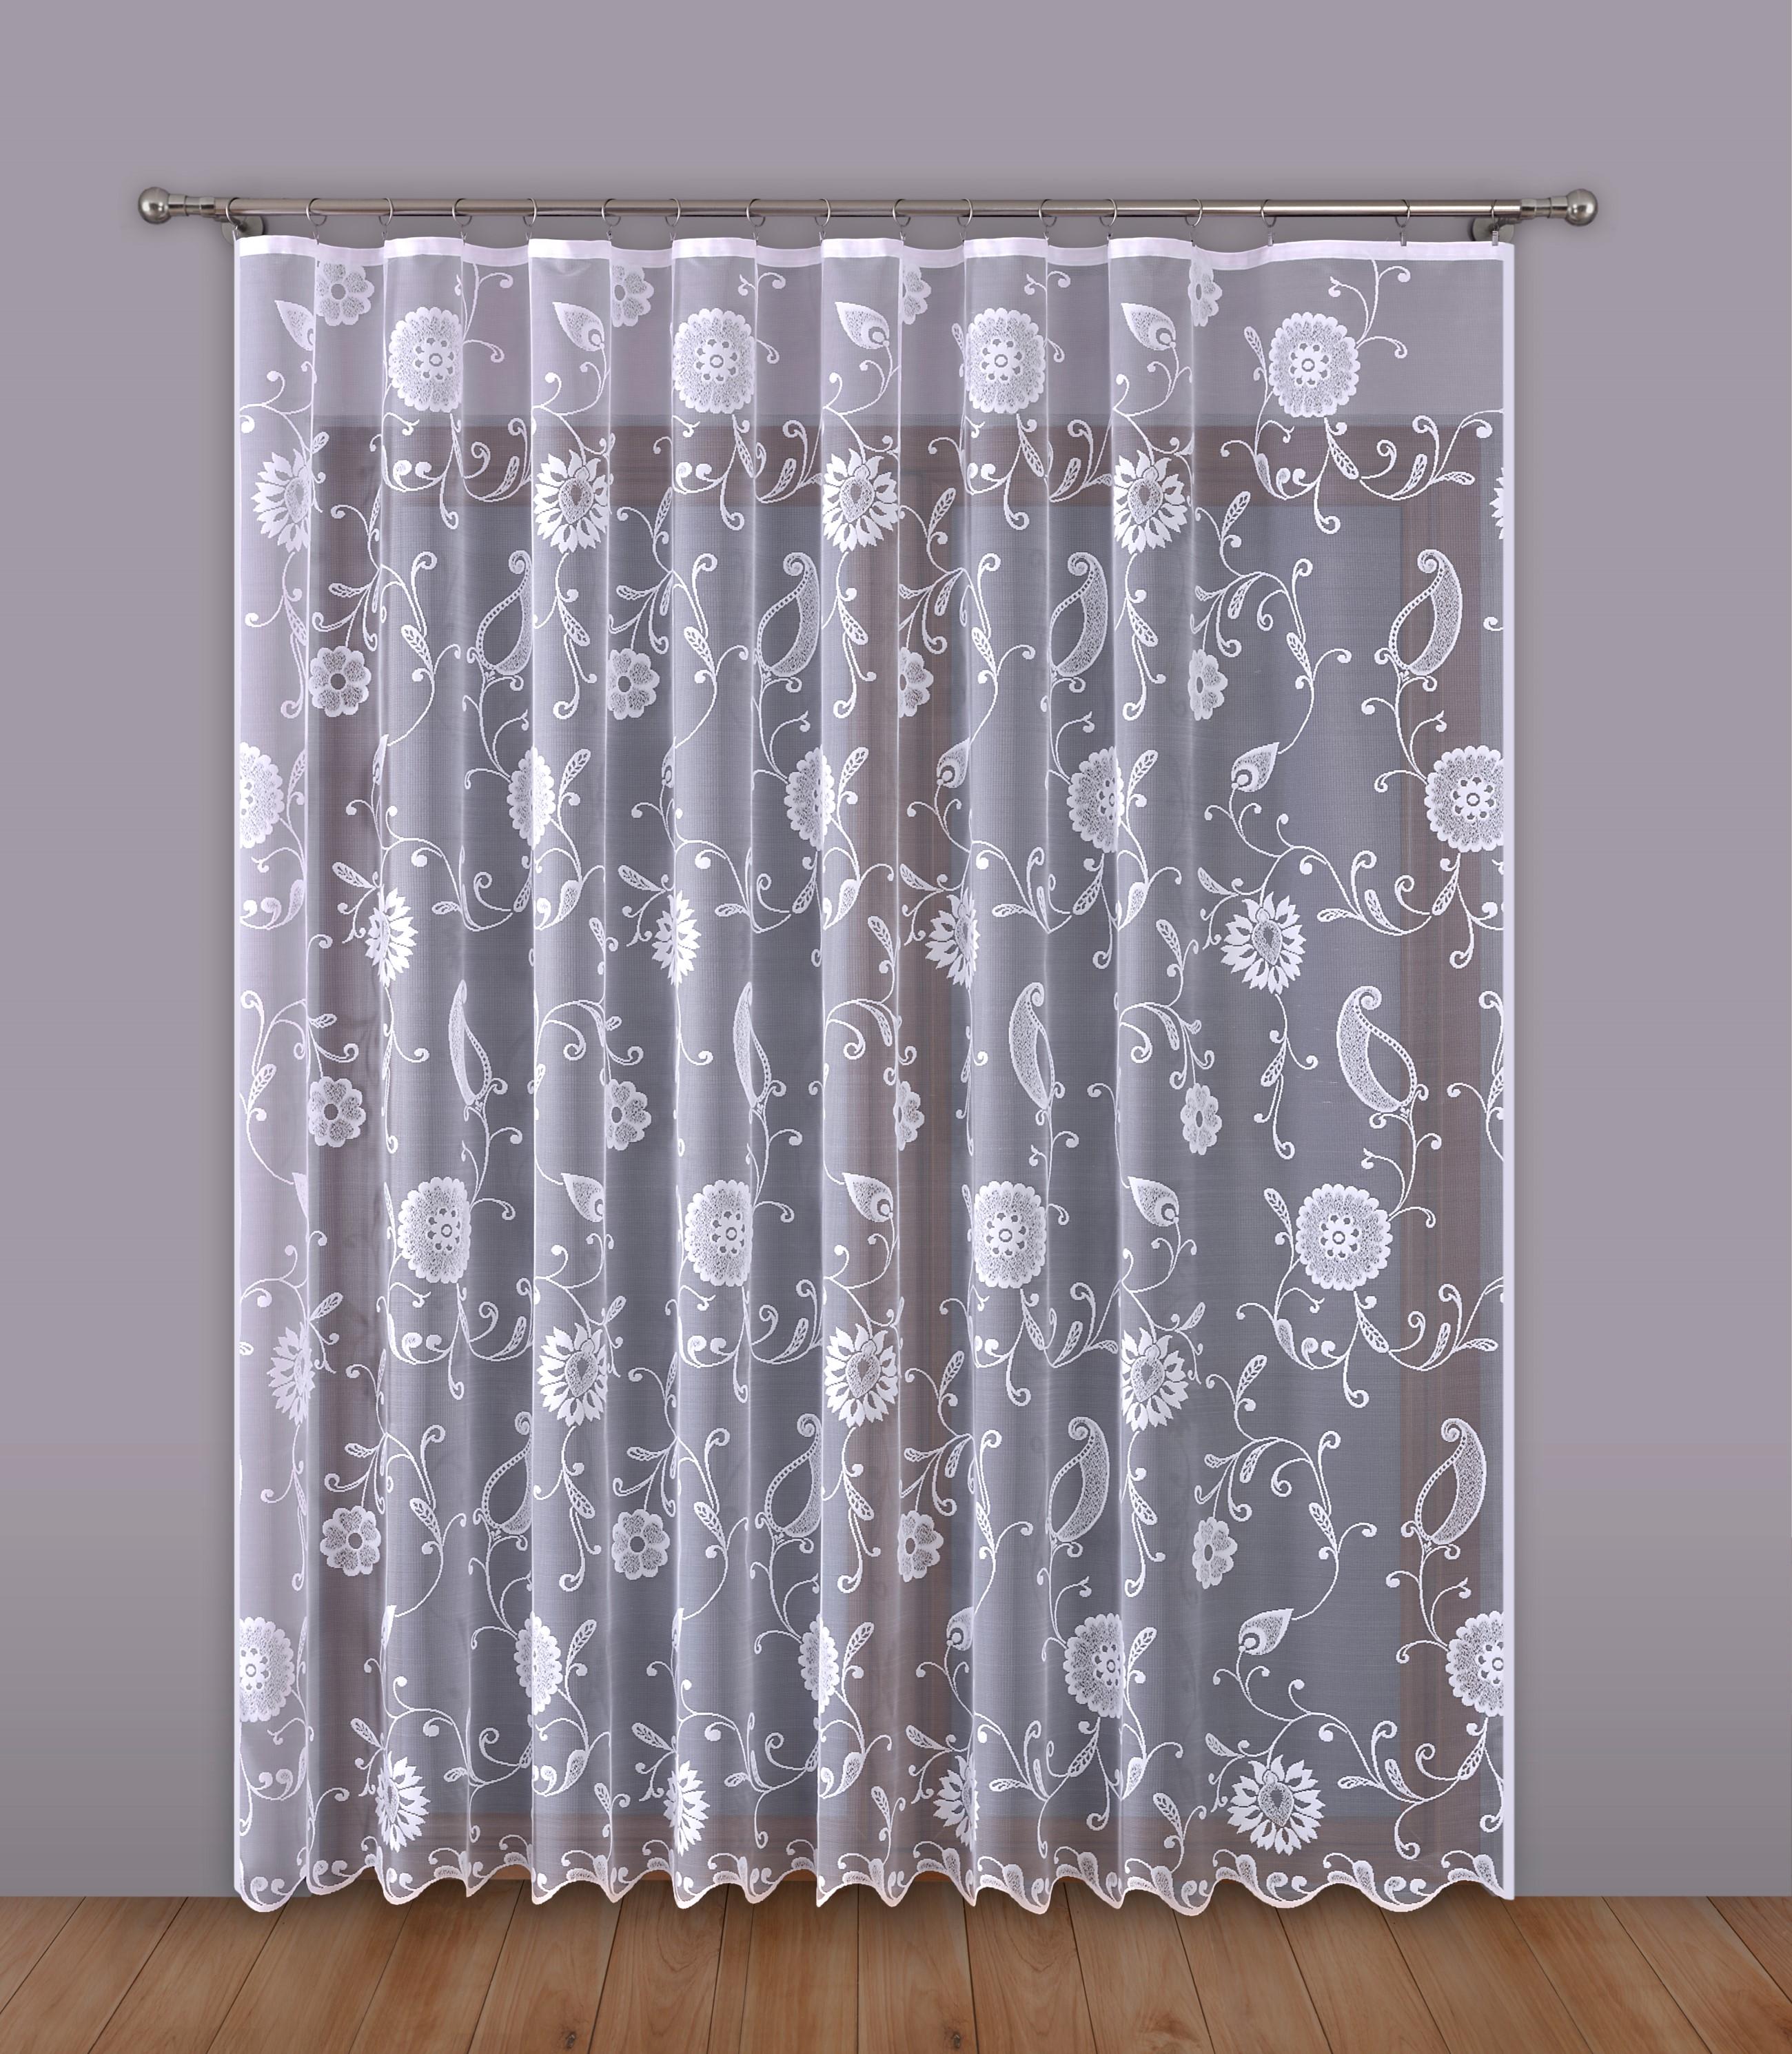 Шторы Primavera Классические шторы Gerry Цвет: Белый шторы primavera классические шторы didi цвет белый